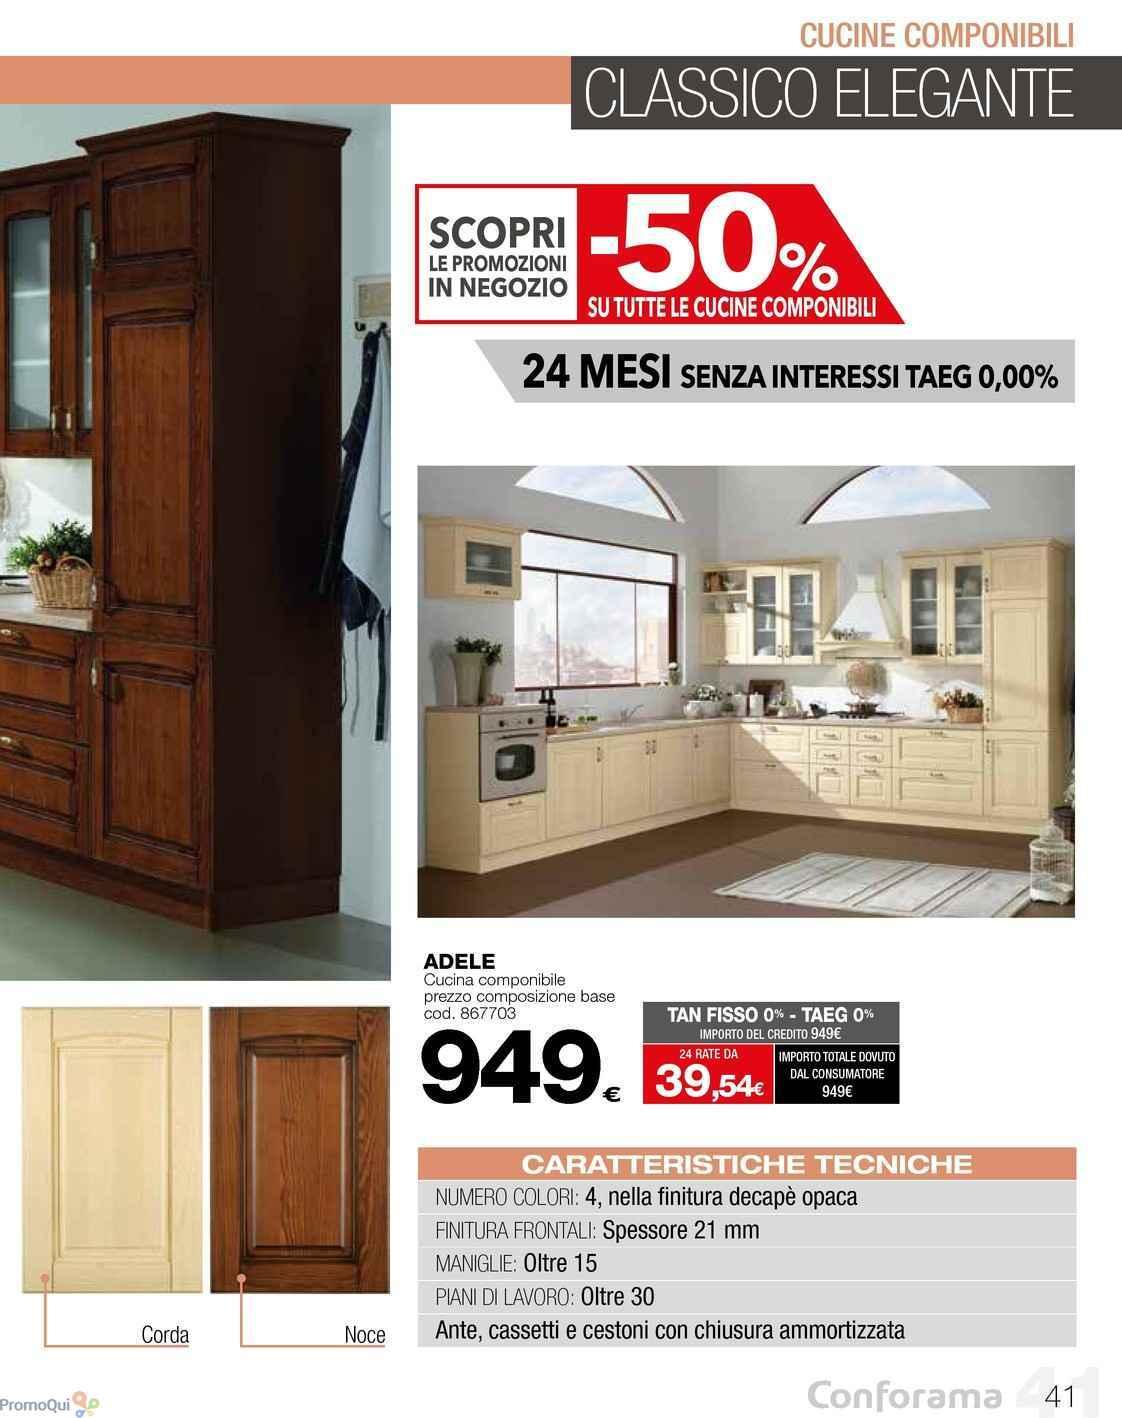 Stunning Conforama Cucine Prezzi Photos - Home Design - joygree.info